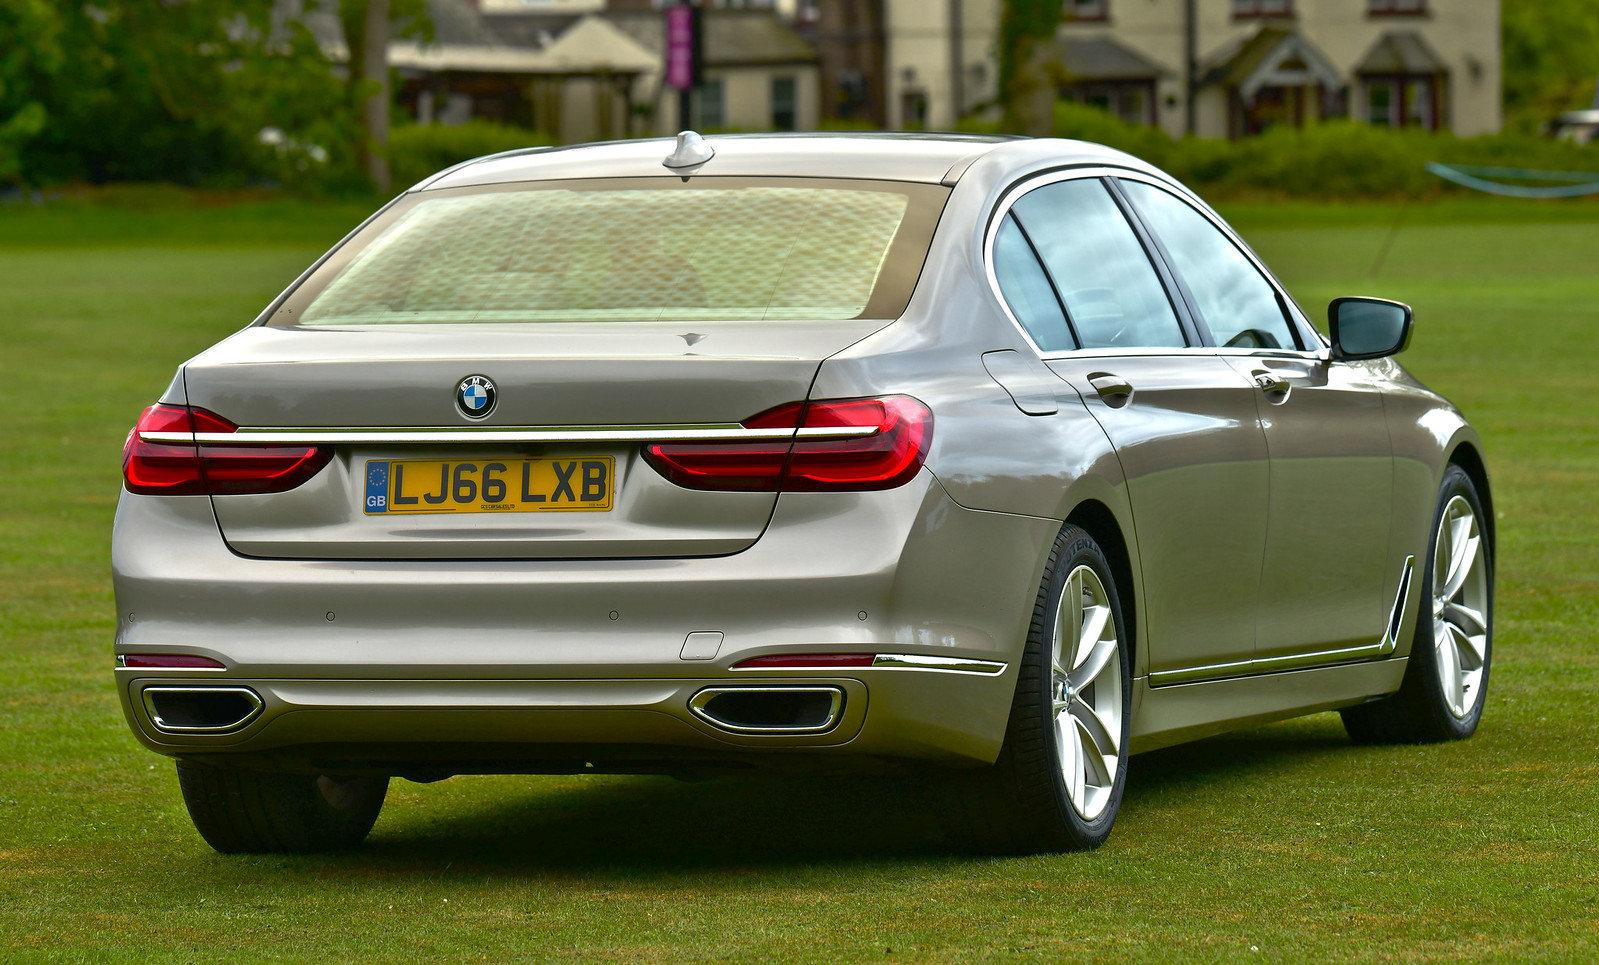 2016 BMW 7 Series Twin Turbo  740Li LWB Saloon 4dr Petrol  SOLD (picture 2 of 6)